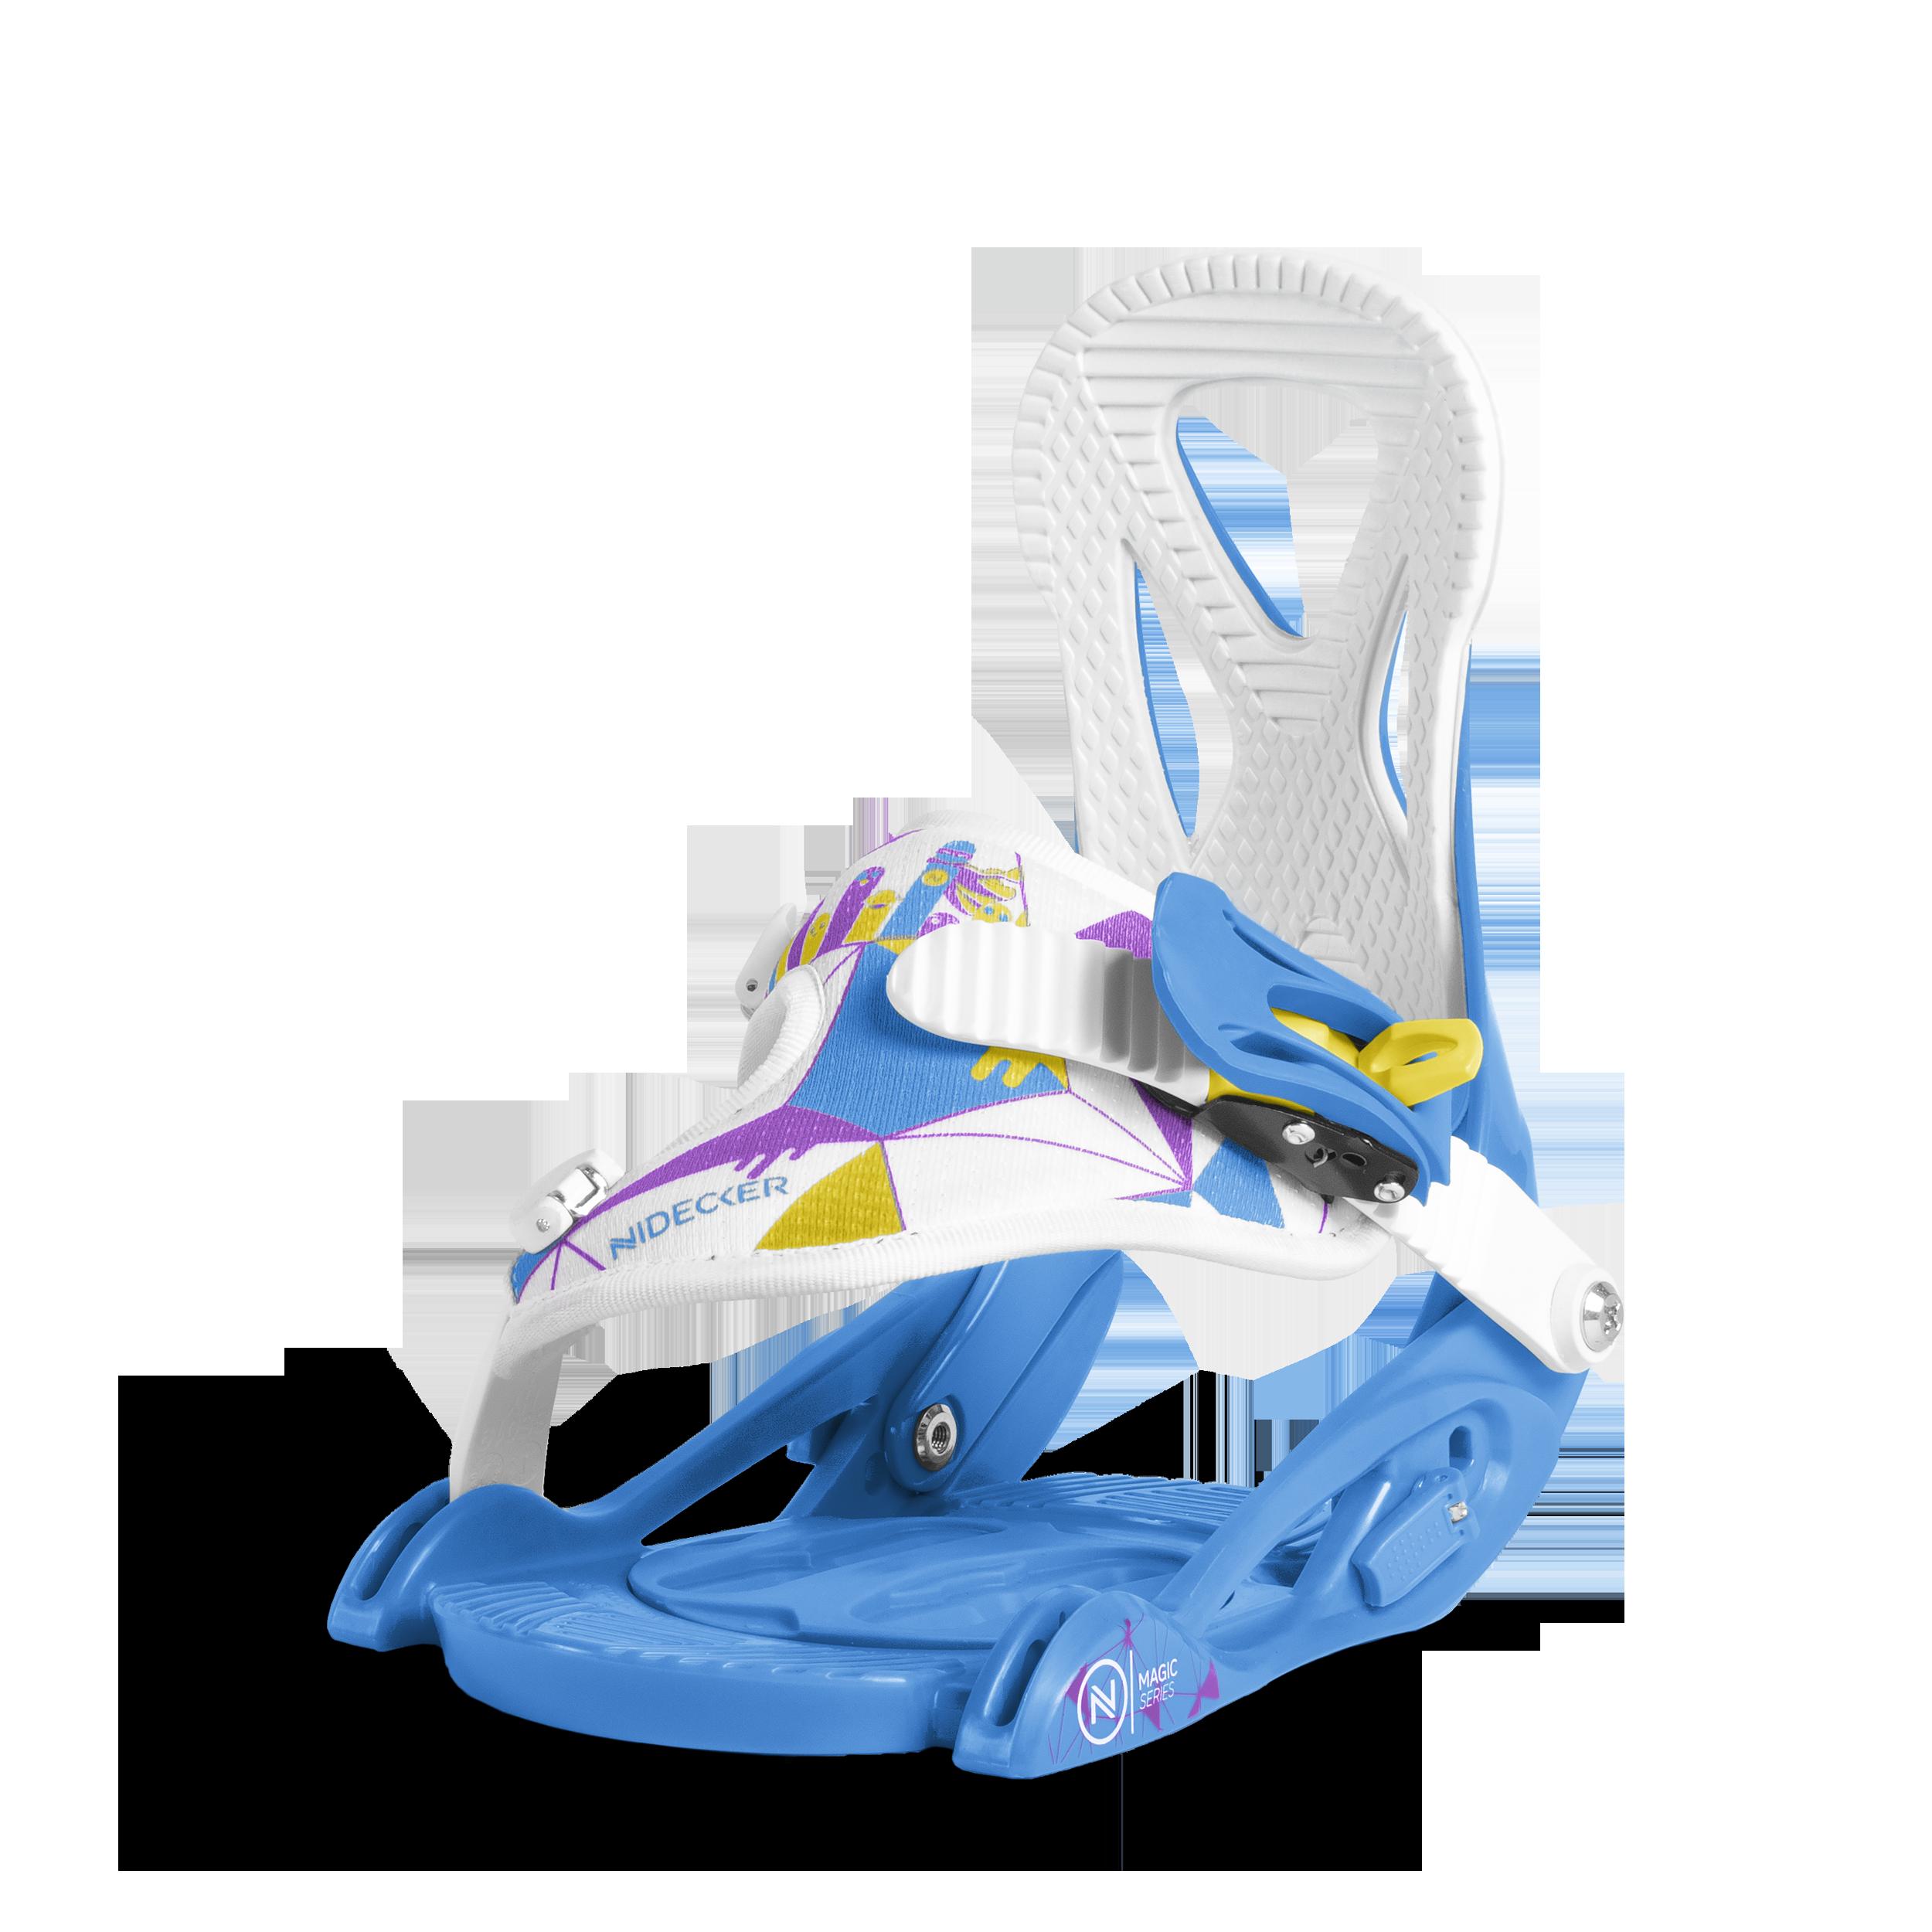 Сноуборд крепления NIDECKER 2017-18 MAGIC SERIES BLUE, Сноуборды - арт. 995690421